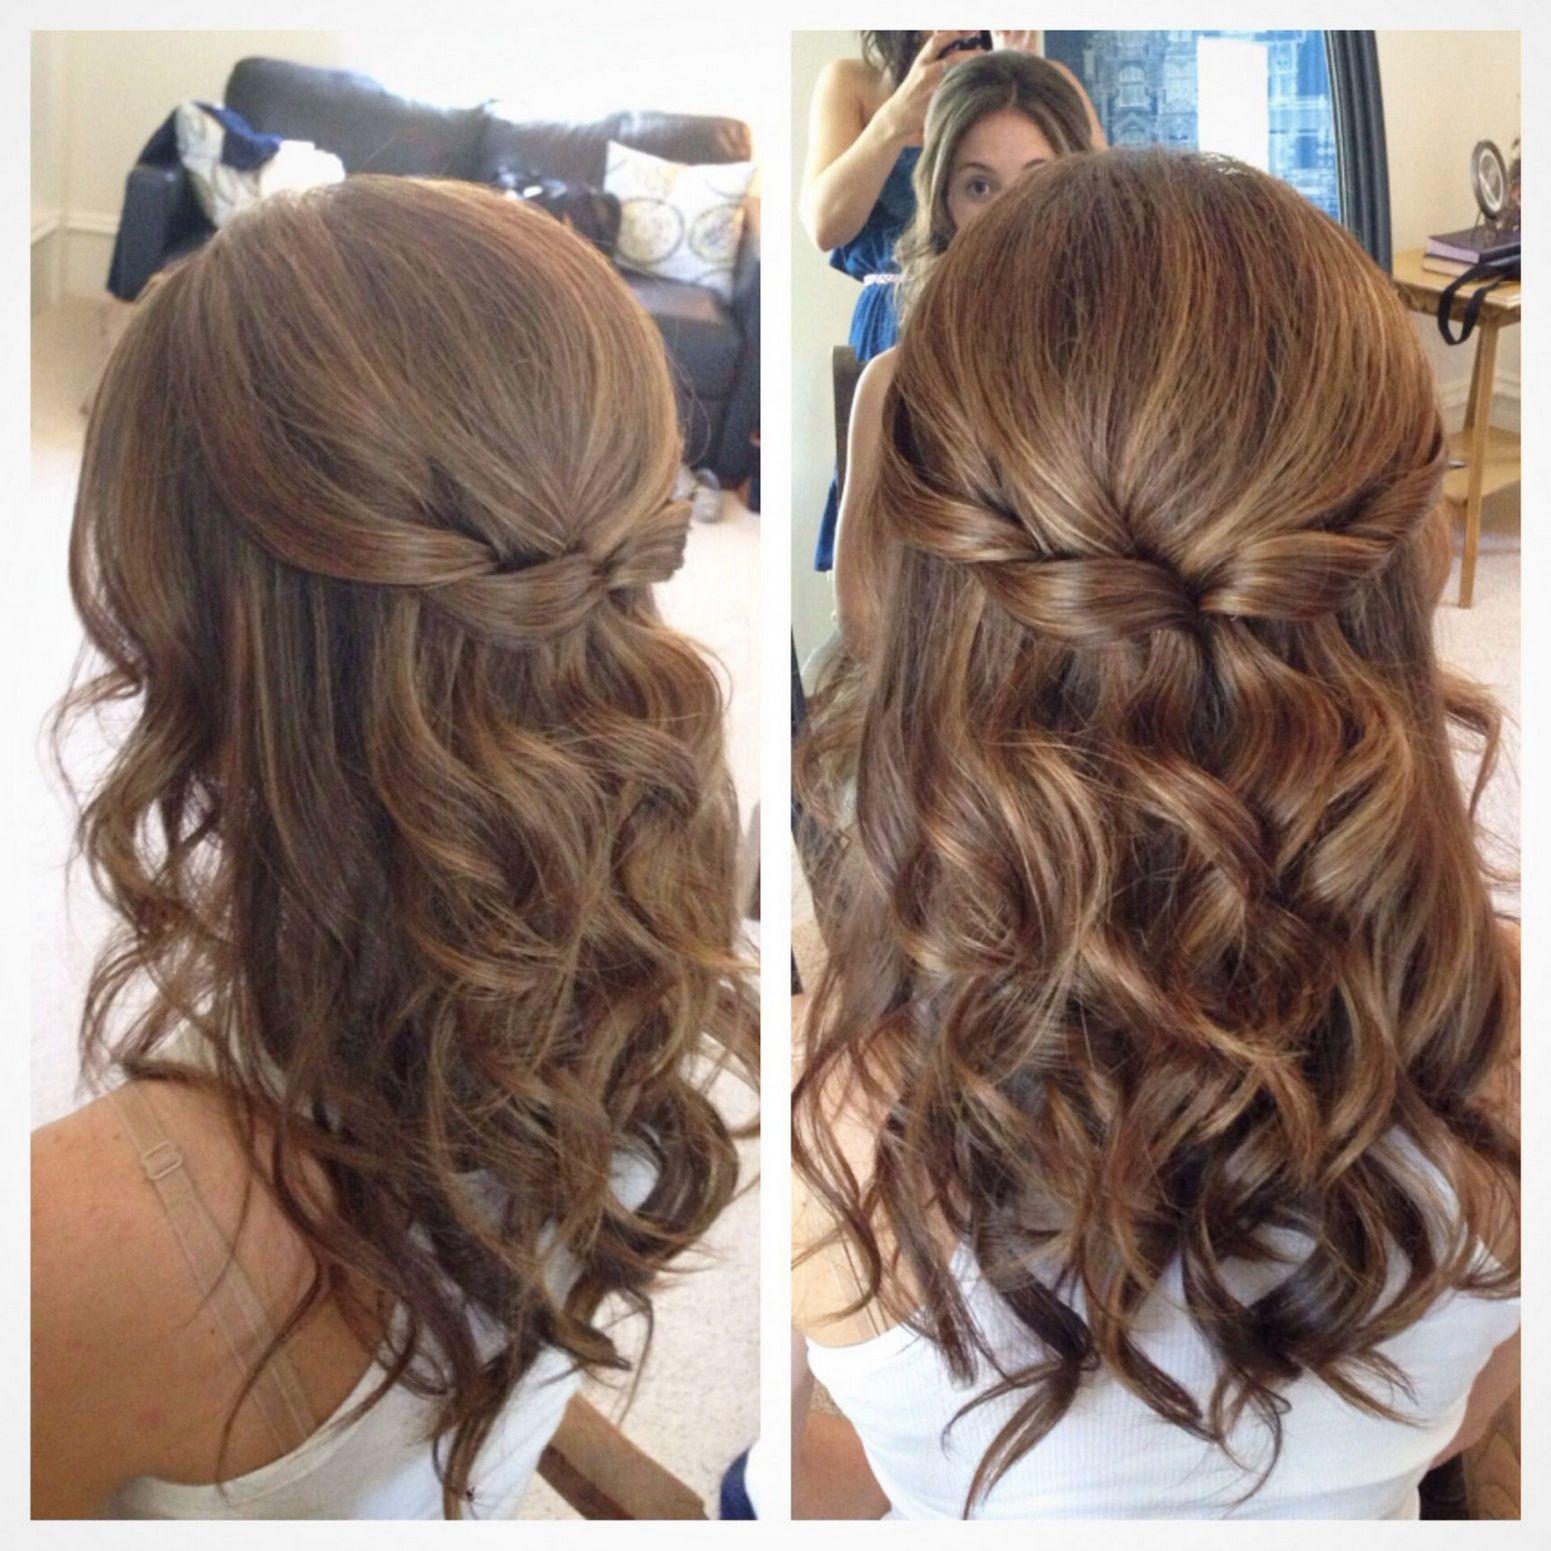 Wedding Hairstyles Medium Length Hair Half Up 2020 59 To Consider For Wedding In 2020 Medium Length Hair Styles Medium Length Curls Wedding Hairstyles Medium Length